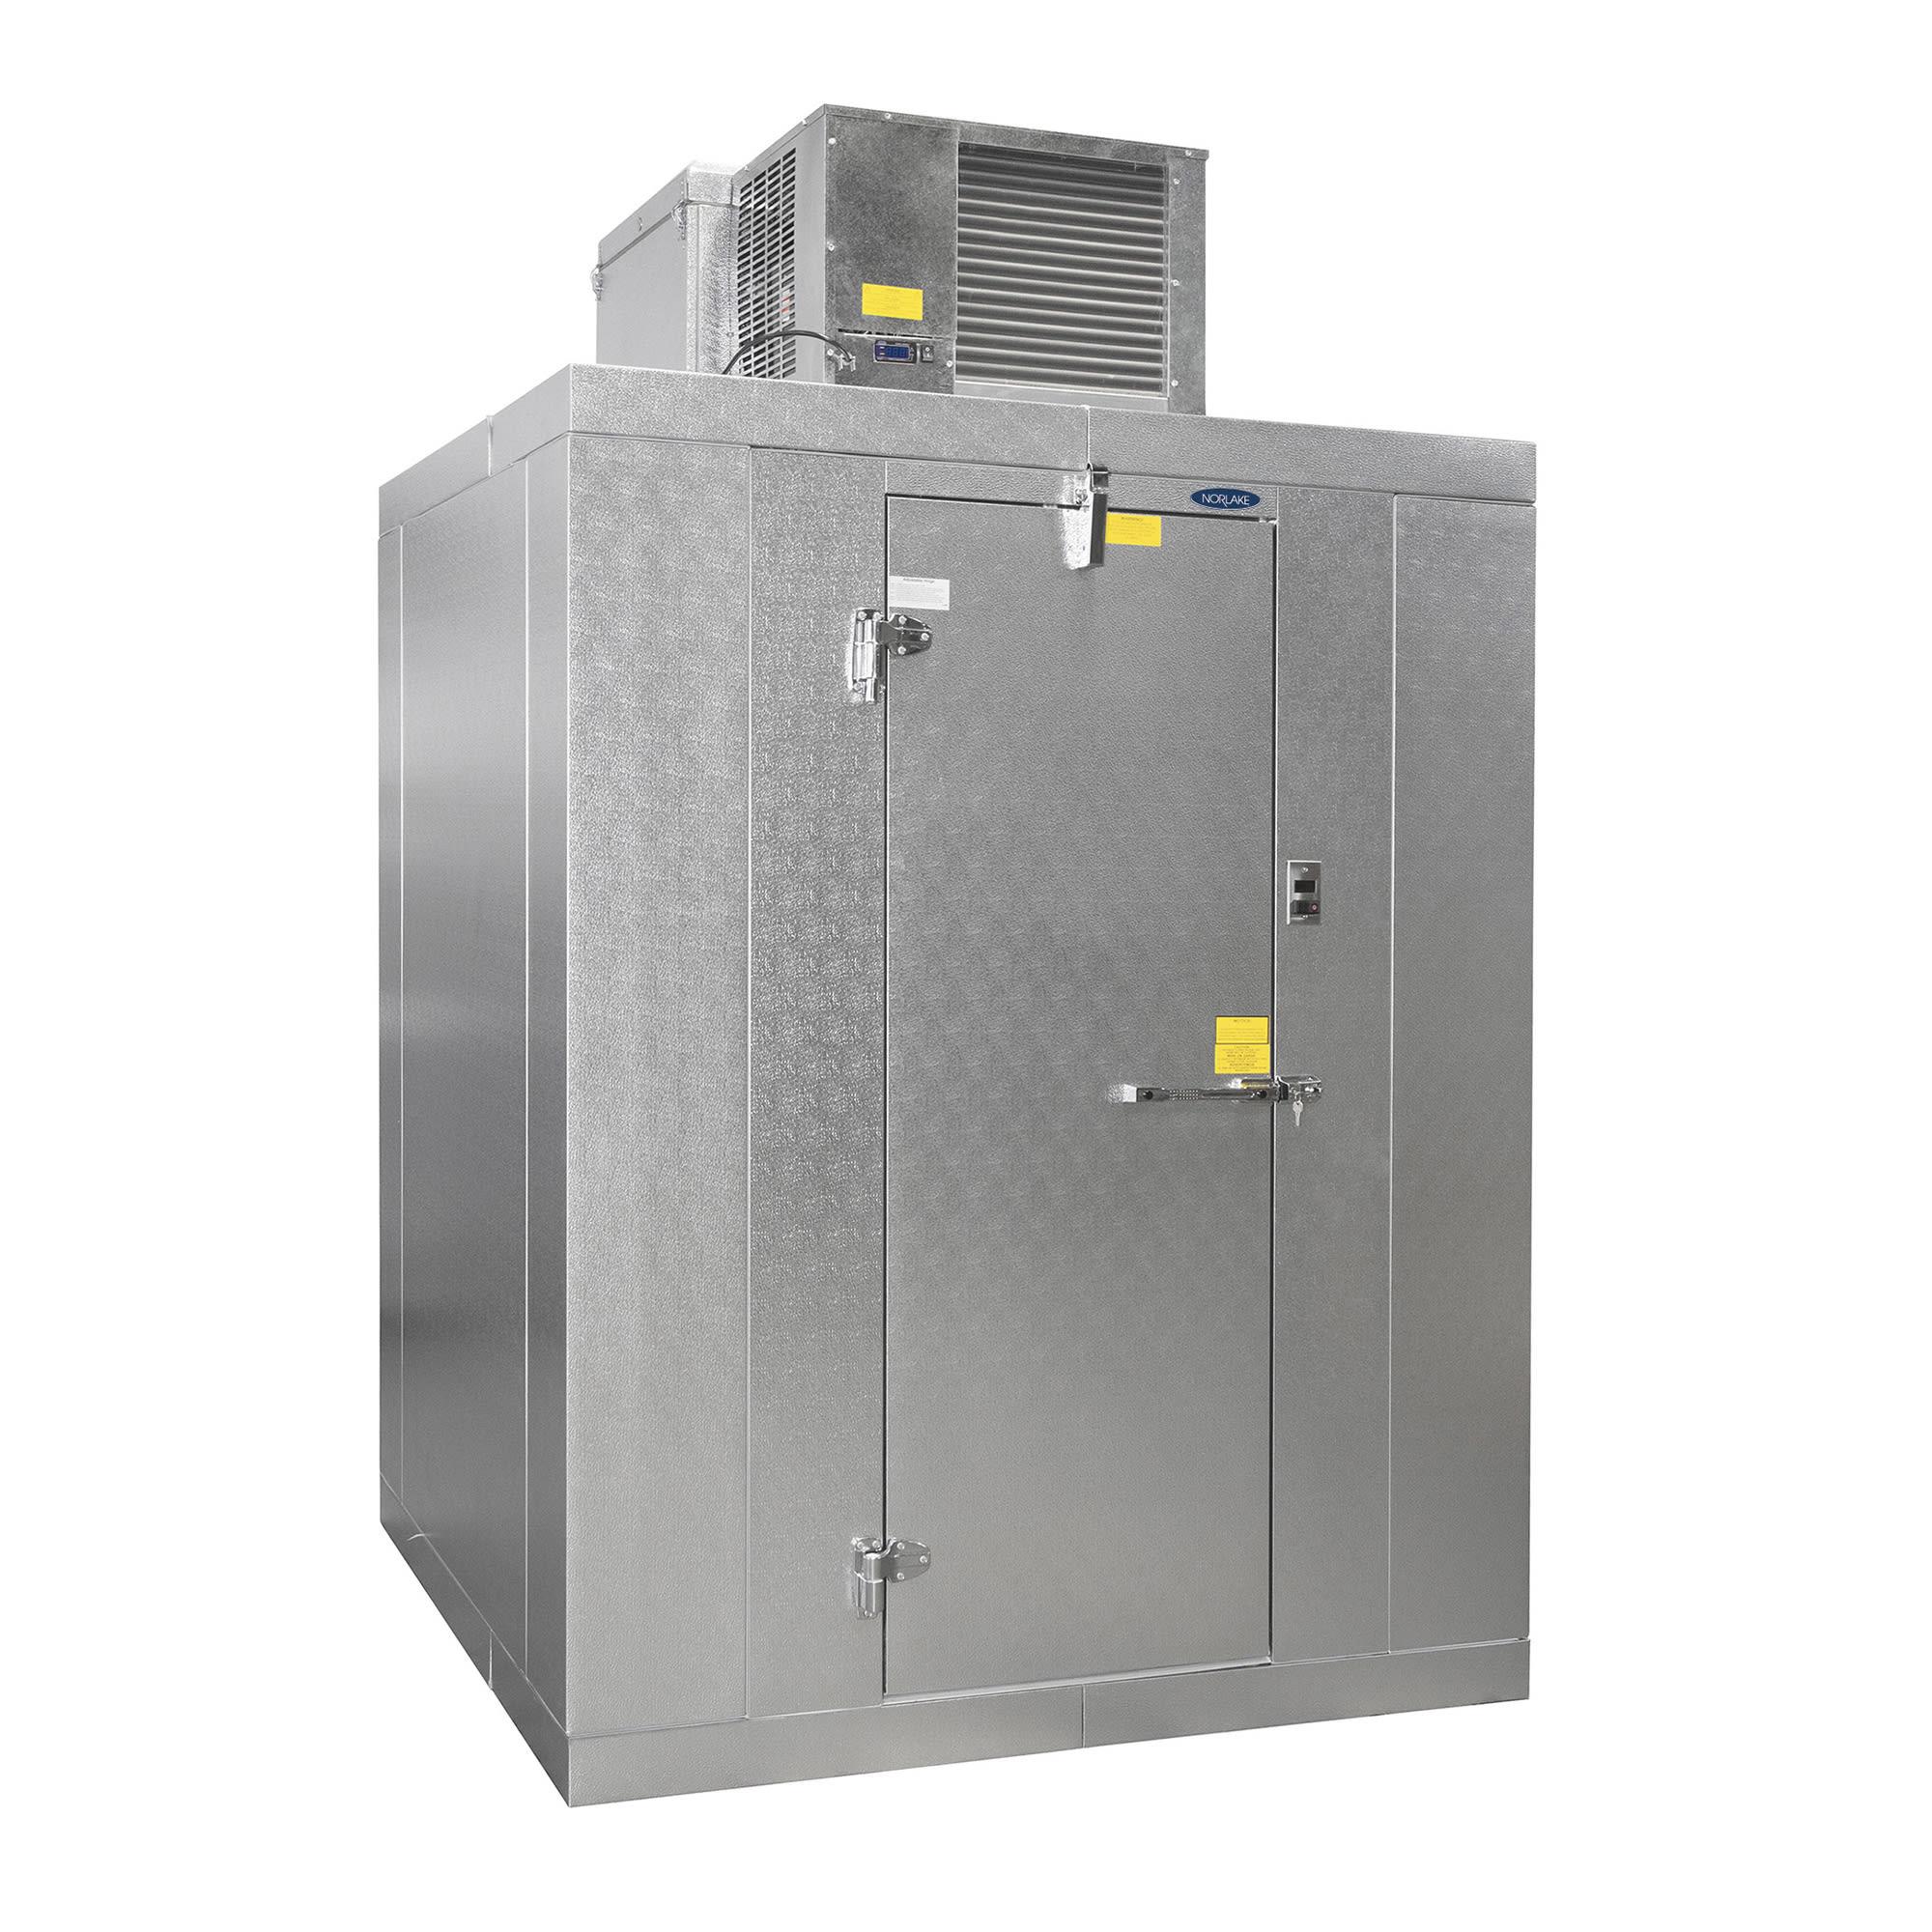 Norlake KODB7788-C Outdoor Walk-In Refrigerator w/ Top Mount Compressor, 8' x 8'